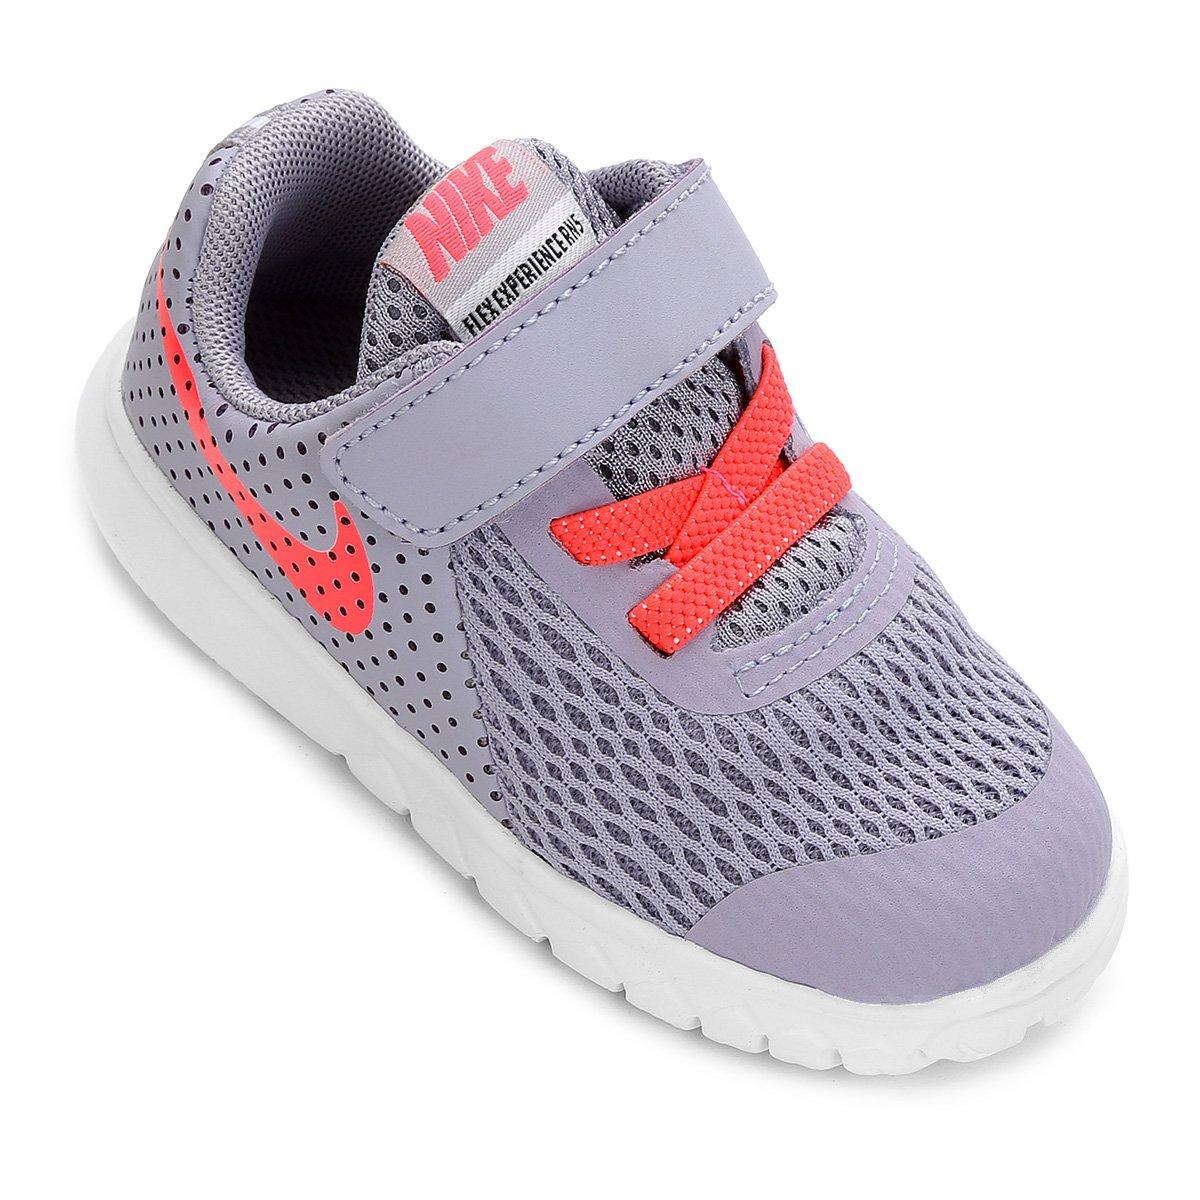 cc10dd1f3fd Tênis Infantil Nike Flex Experience 5 - Compre Agora